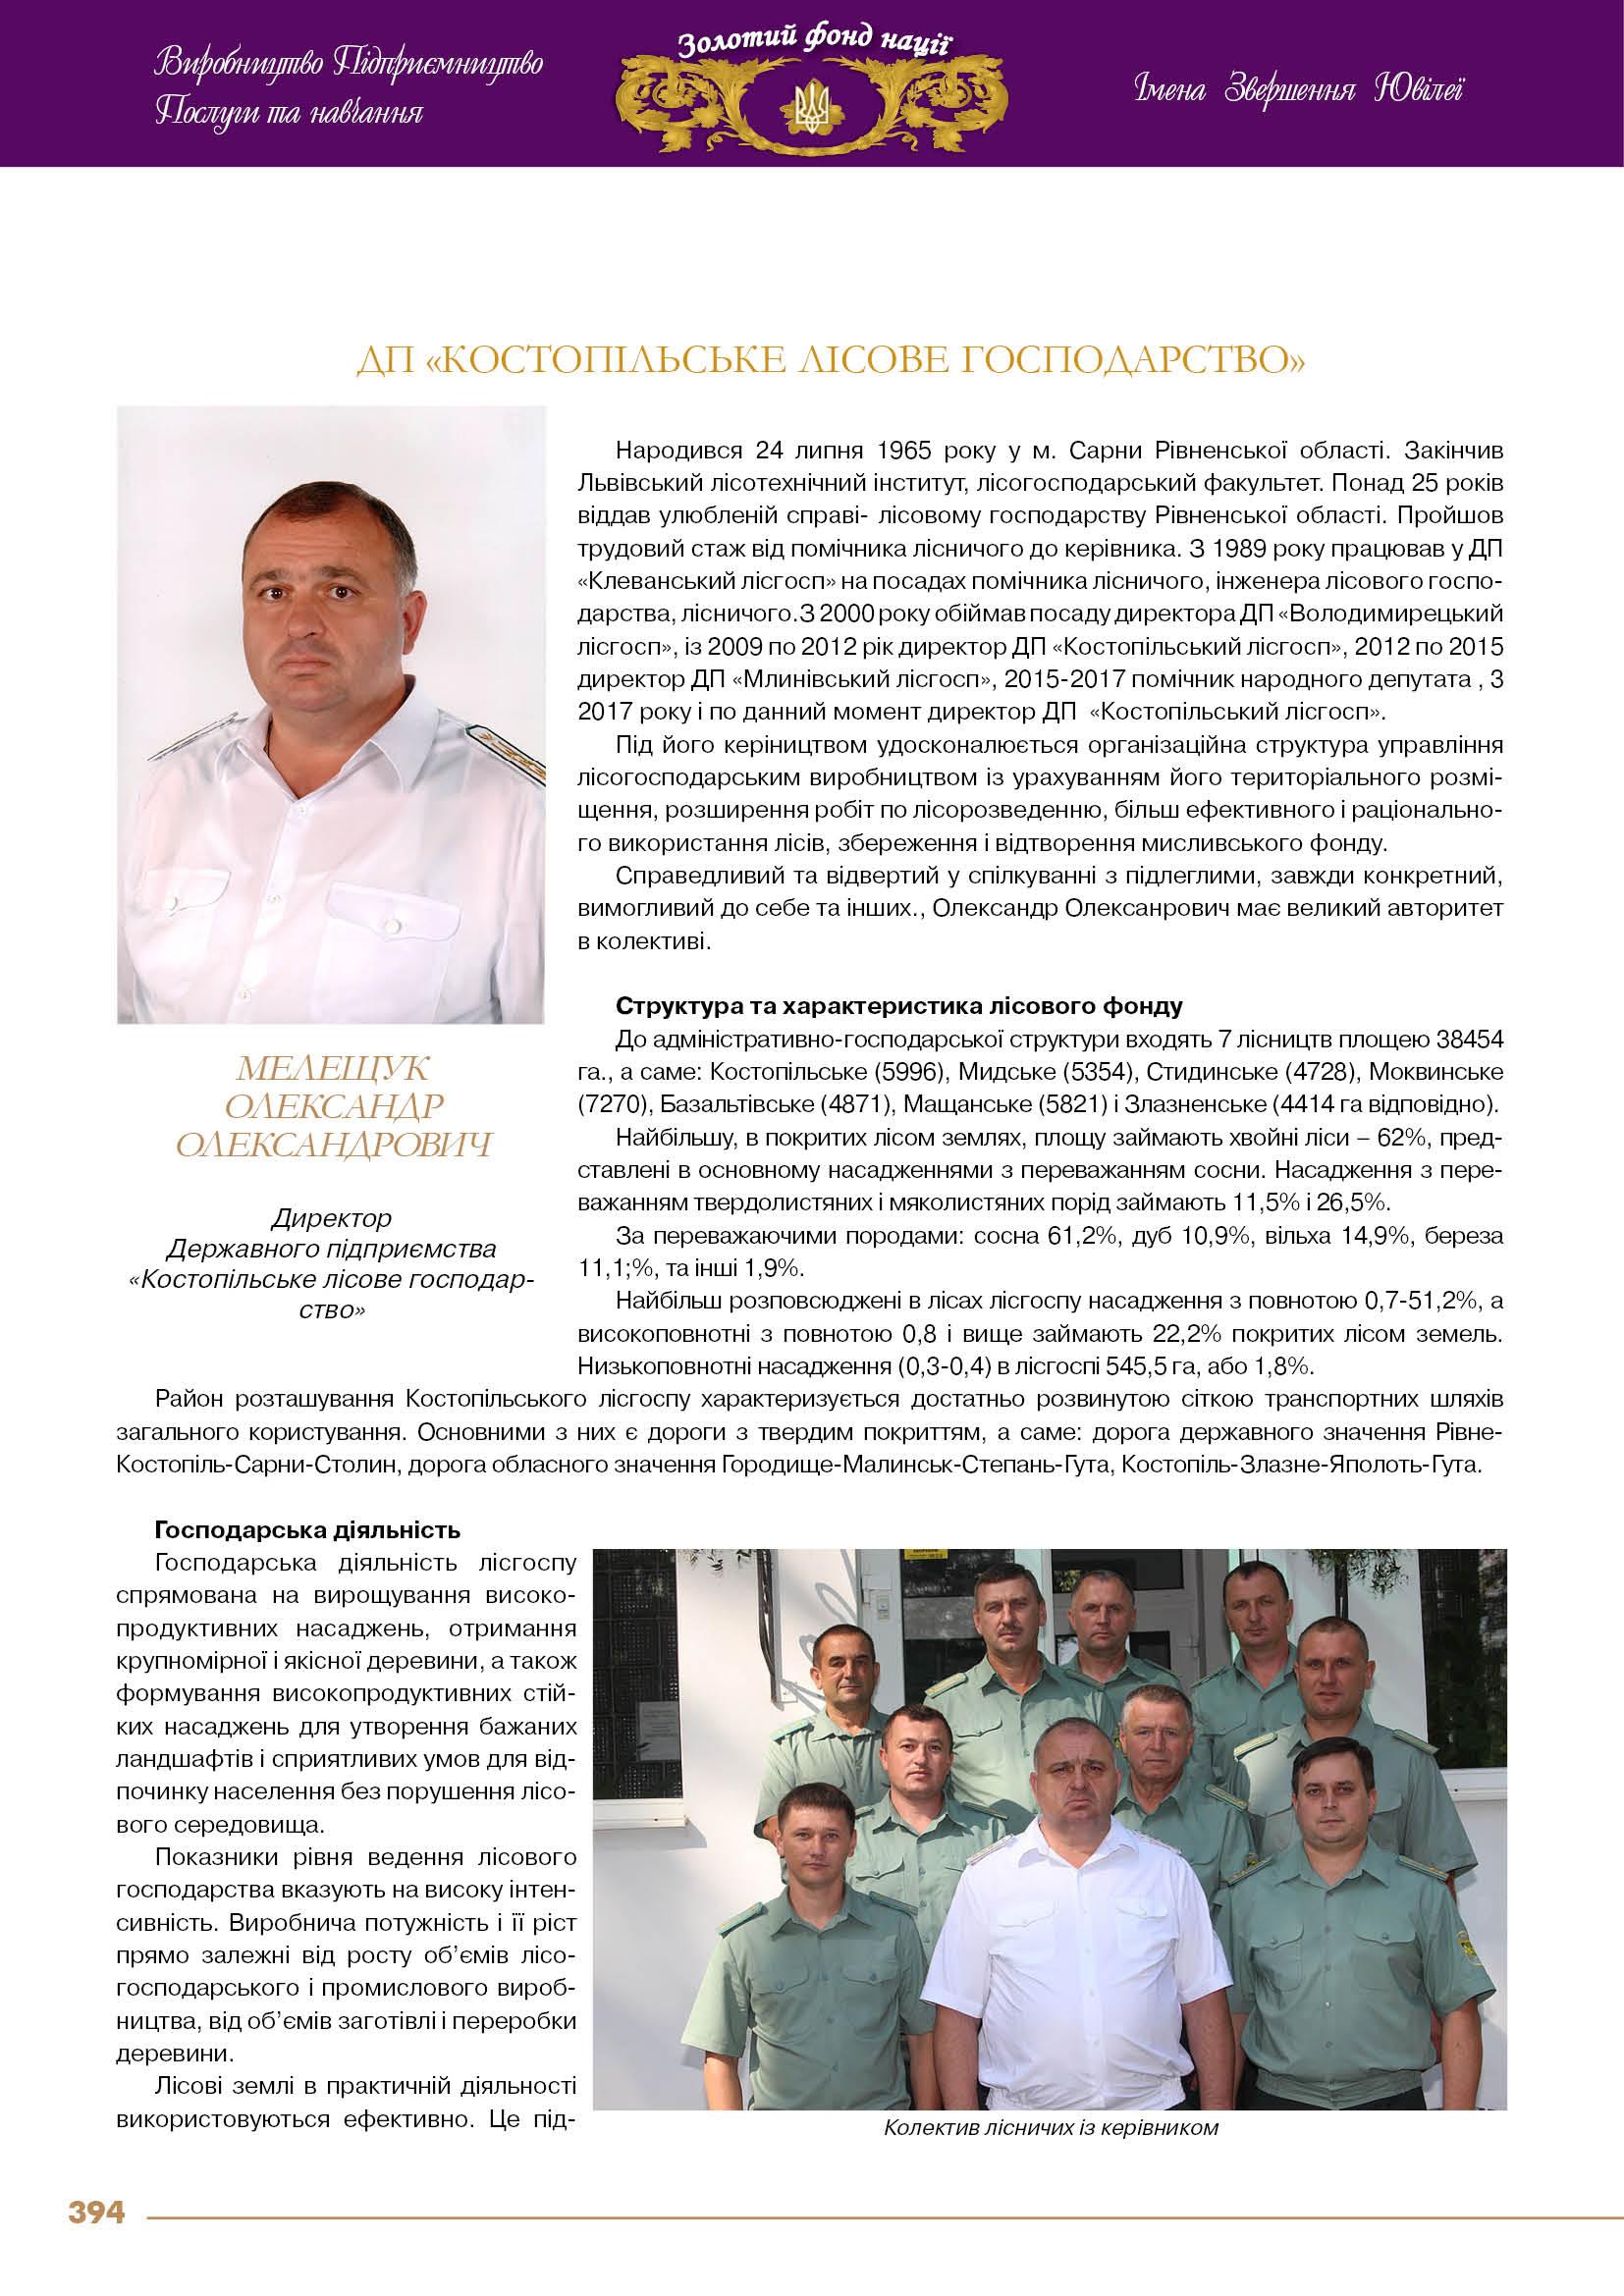 Мелещук Олександр Олександрович